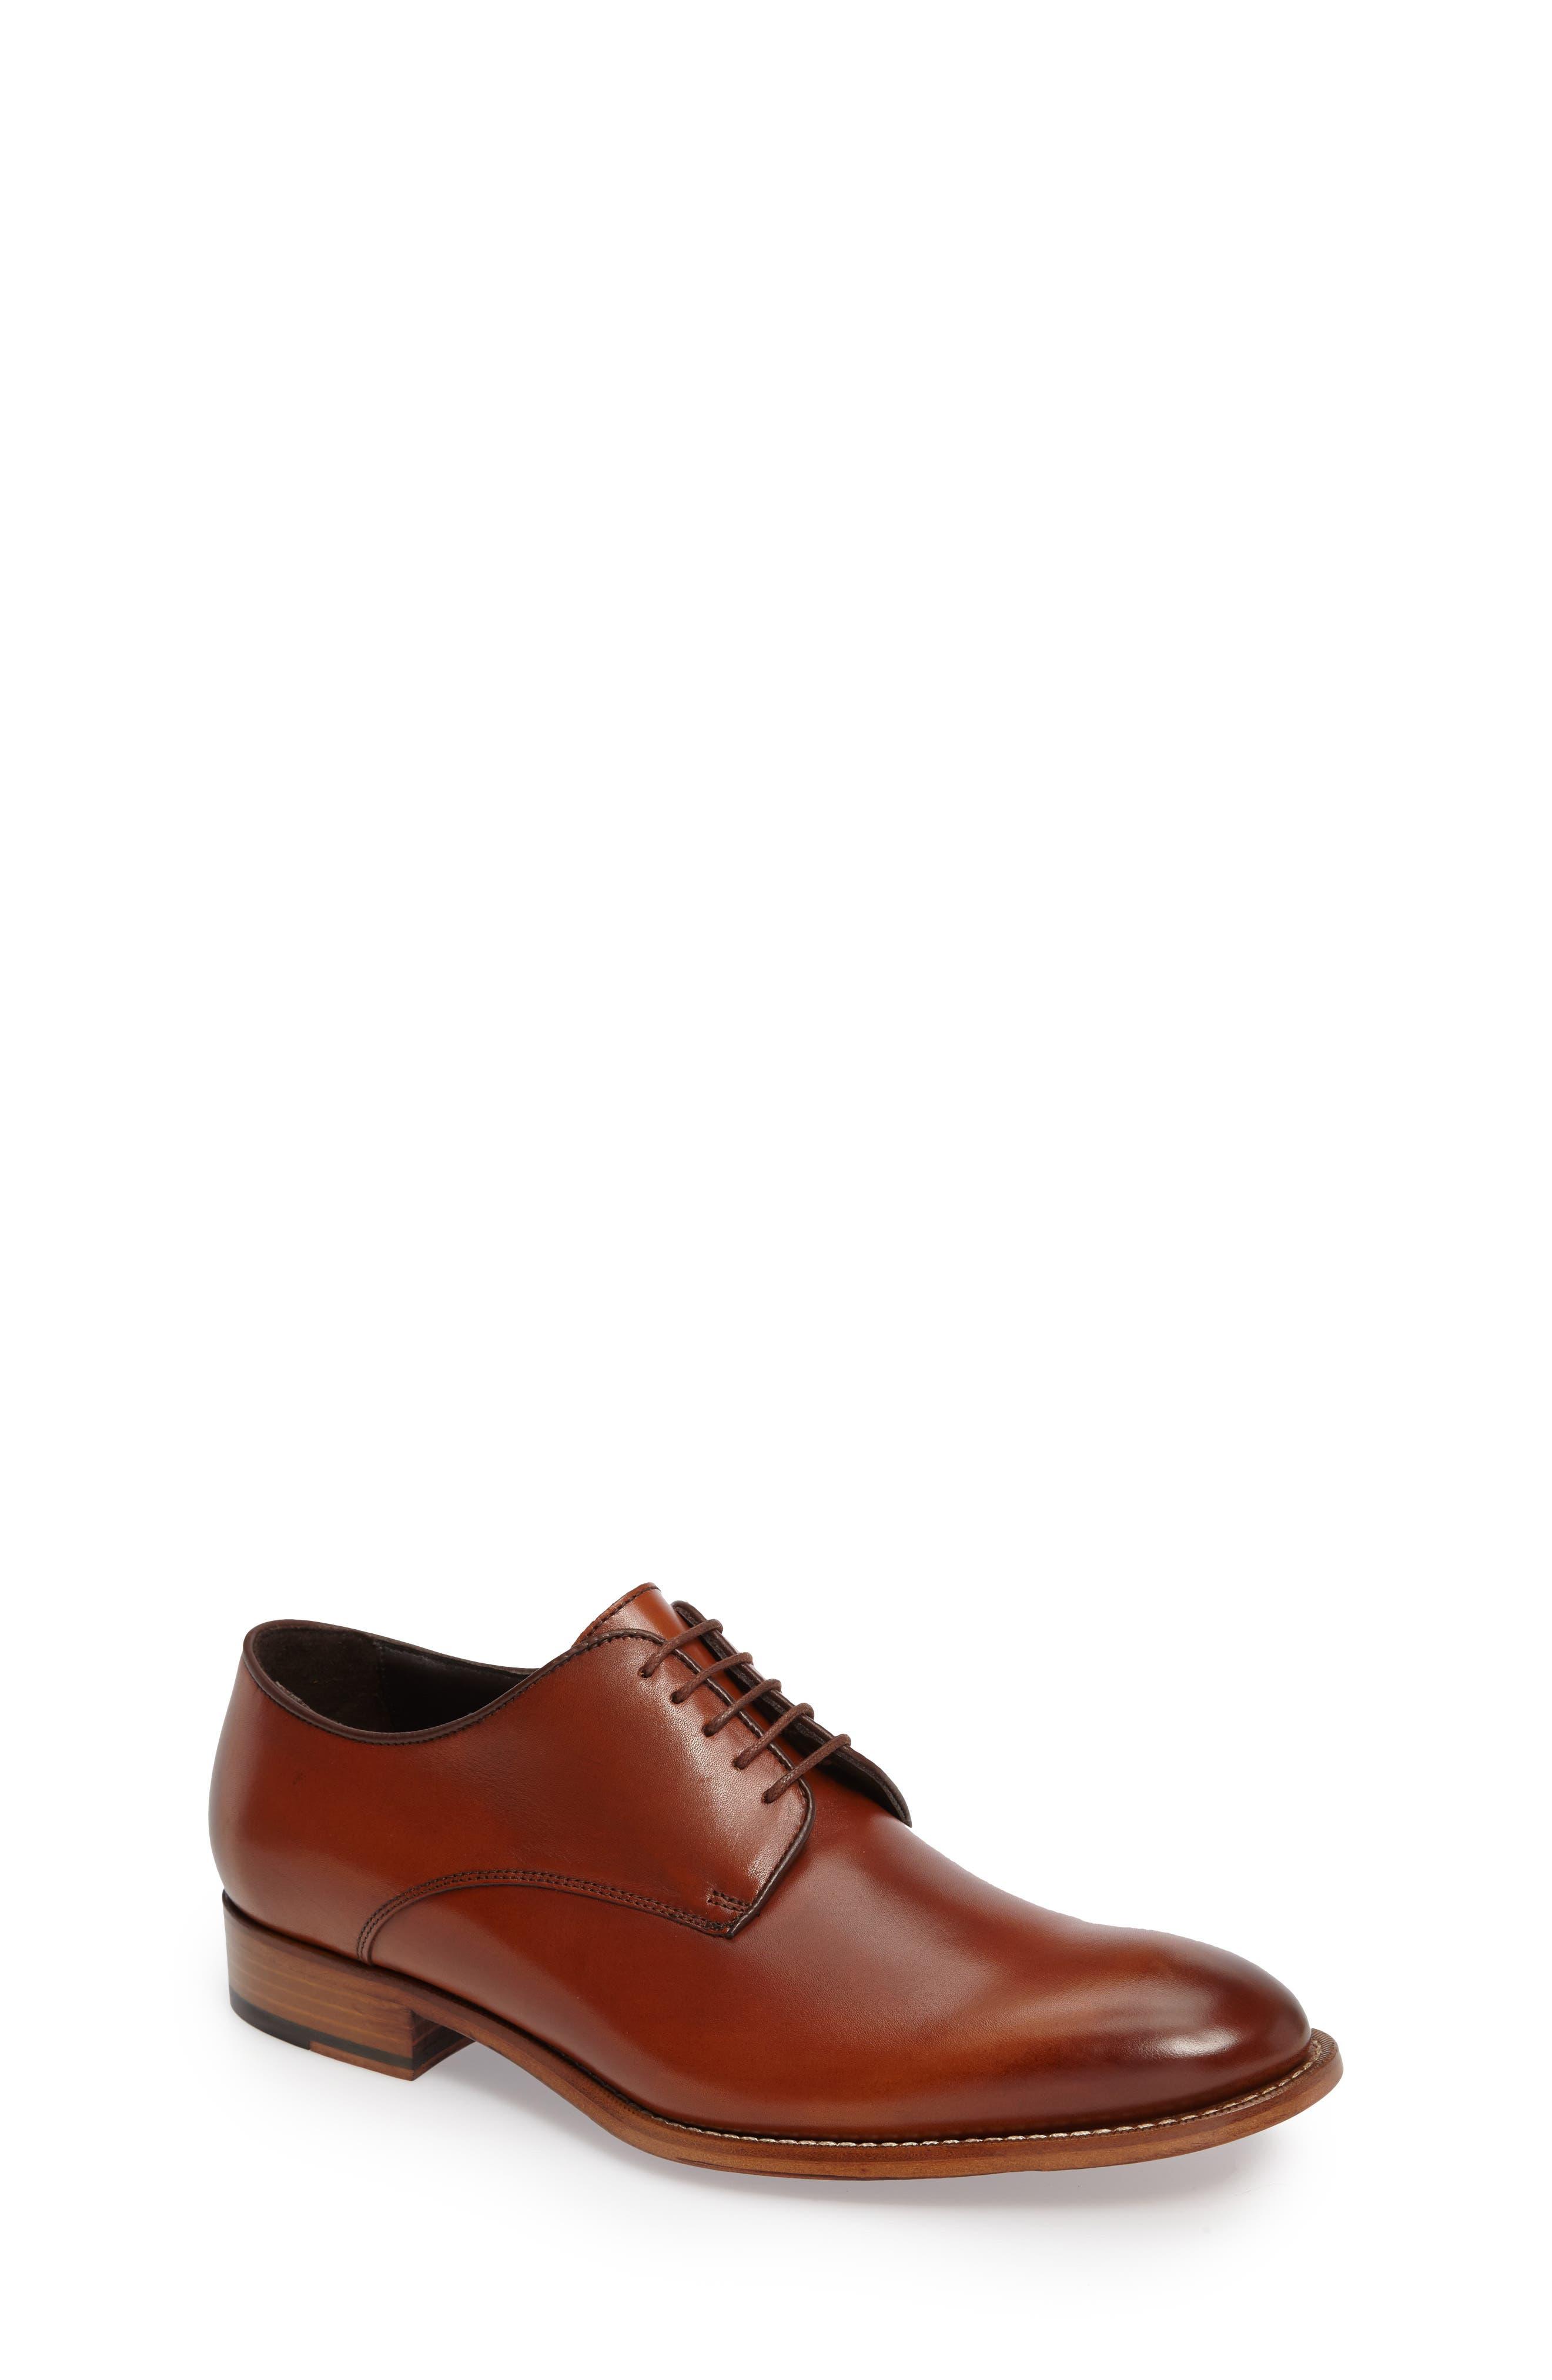 Main Image - To Boot New York Hank Plain Toe Derby (Men)